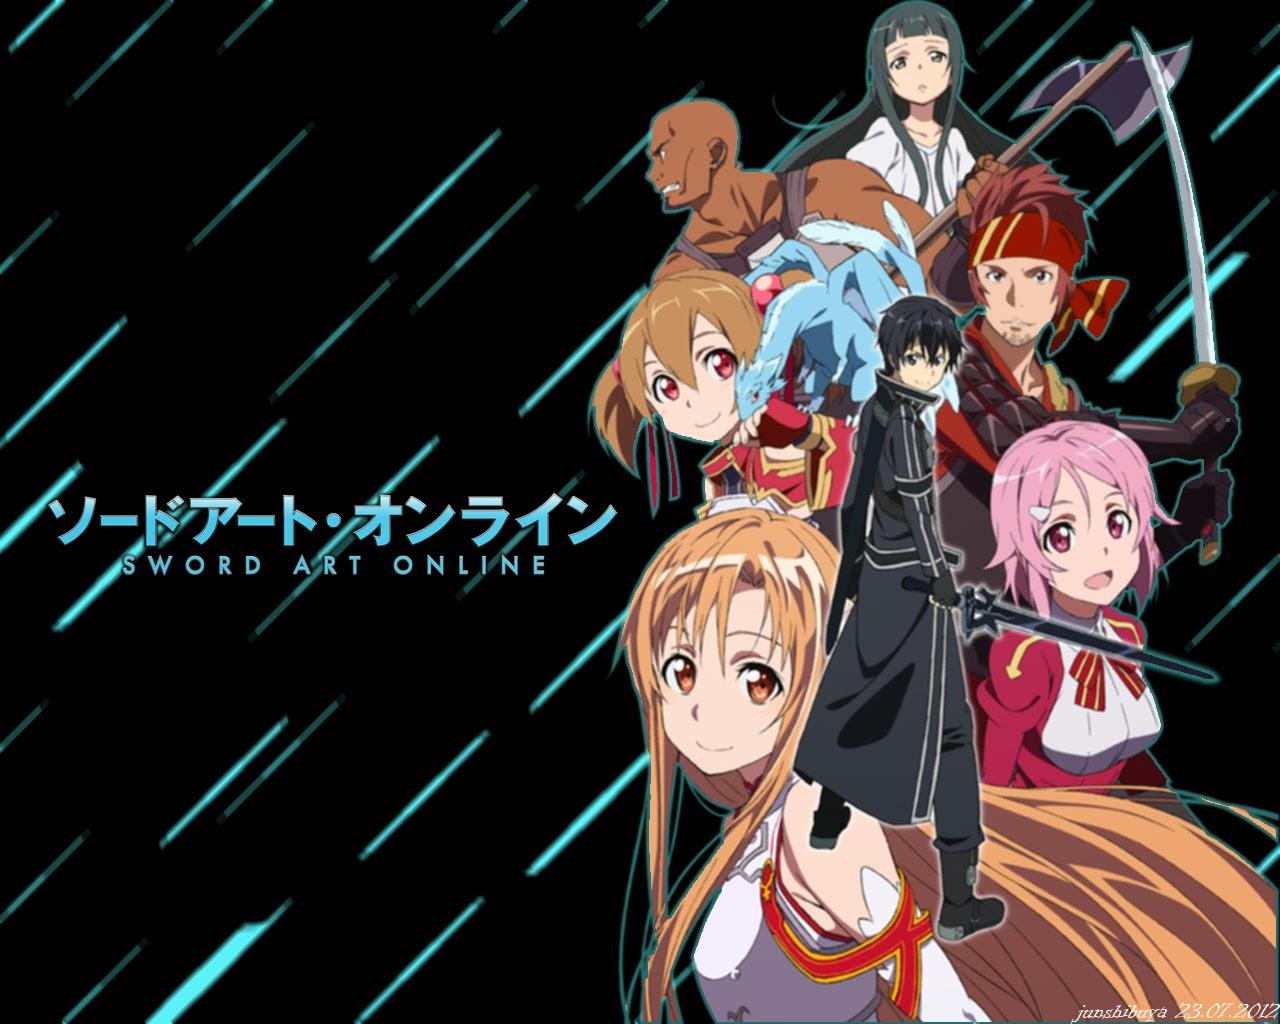 Sword Art Online: Sword Art Online Introduction about ...